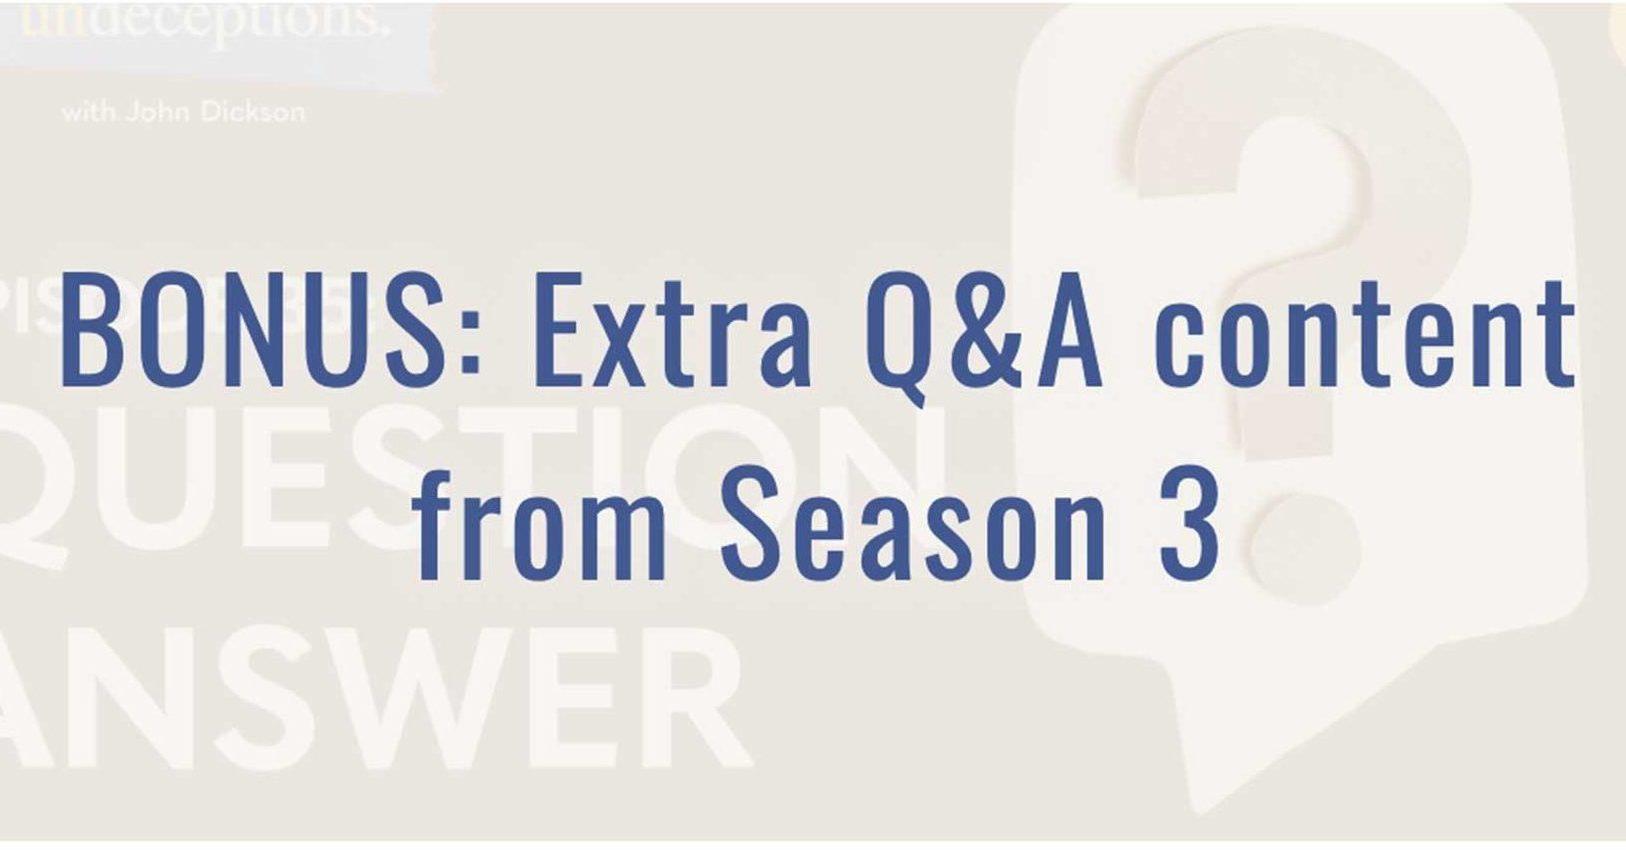 BONUS: Extra Q&A Content From Season 3